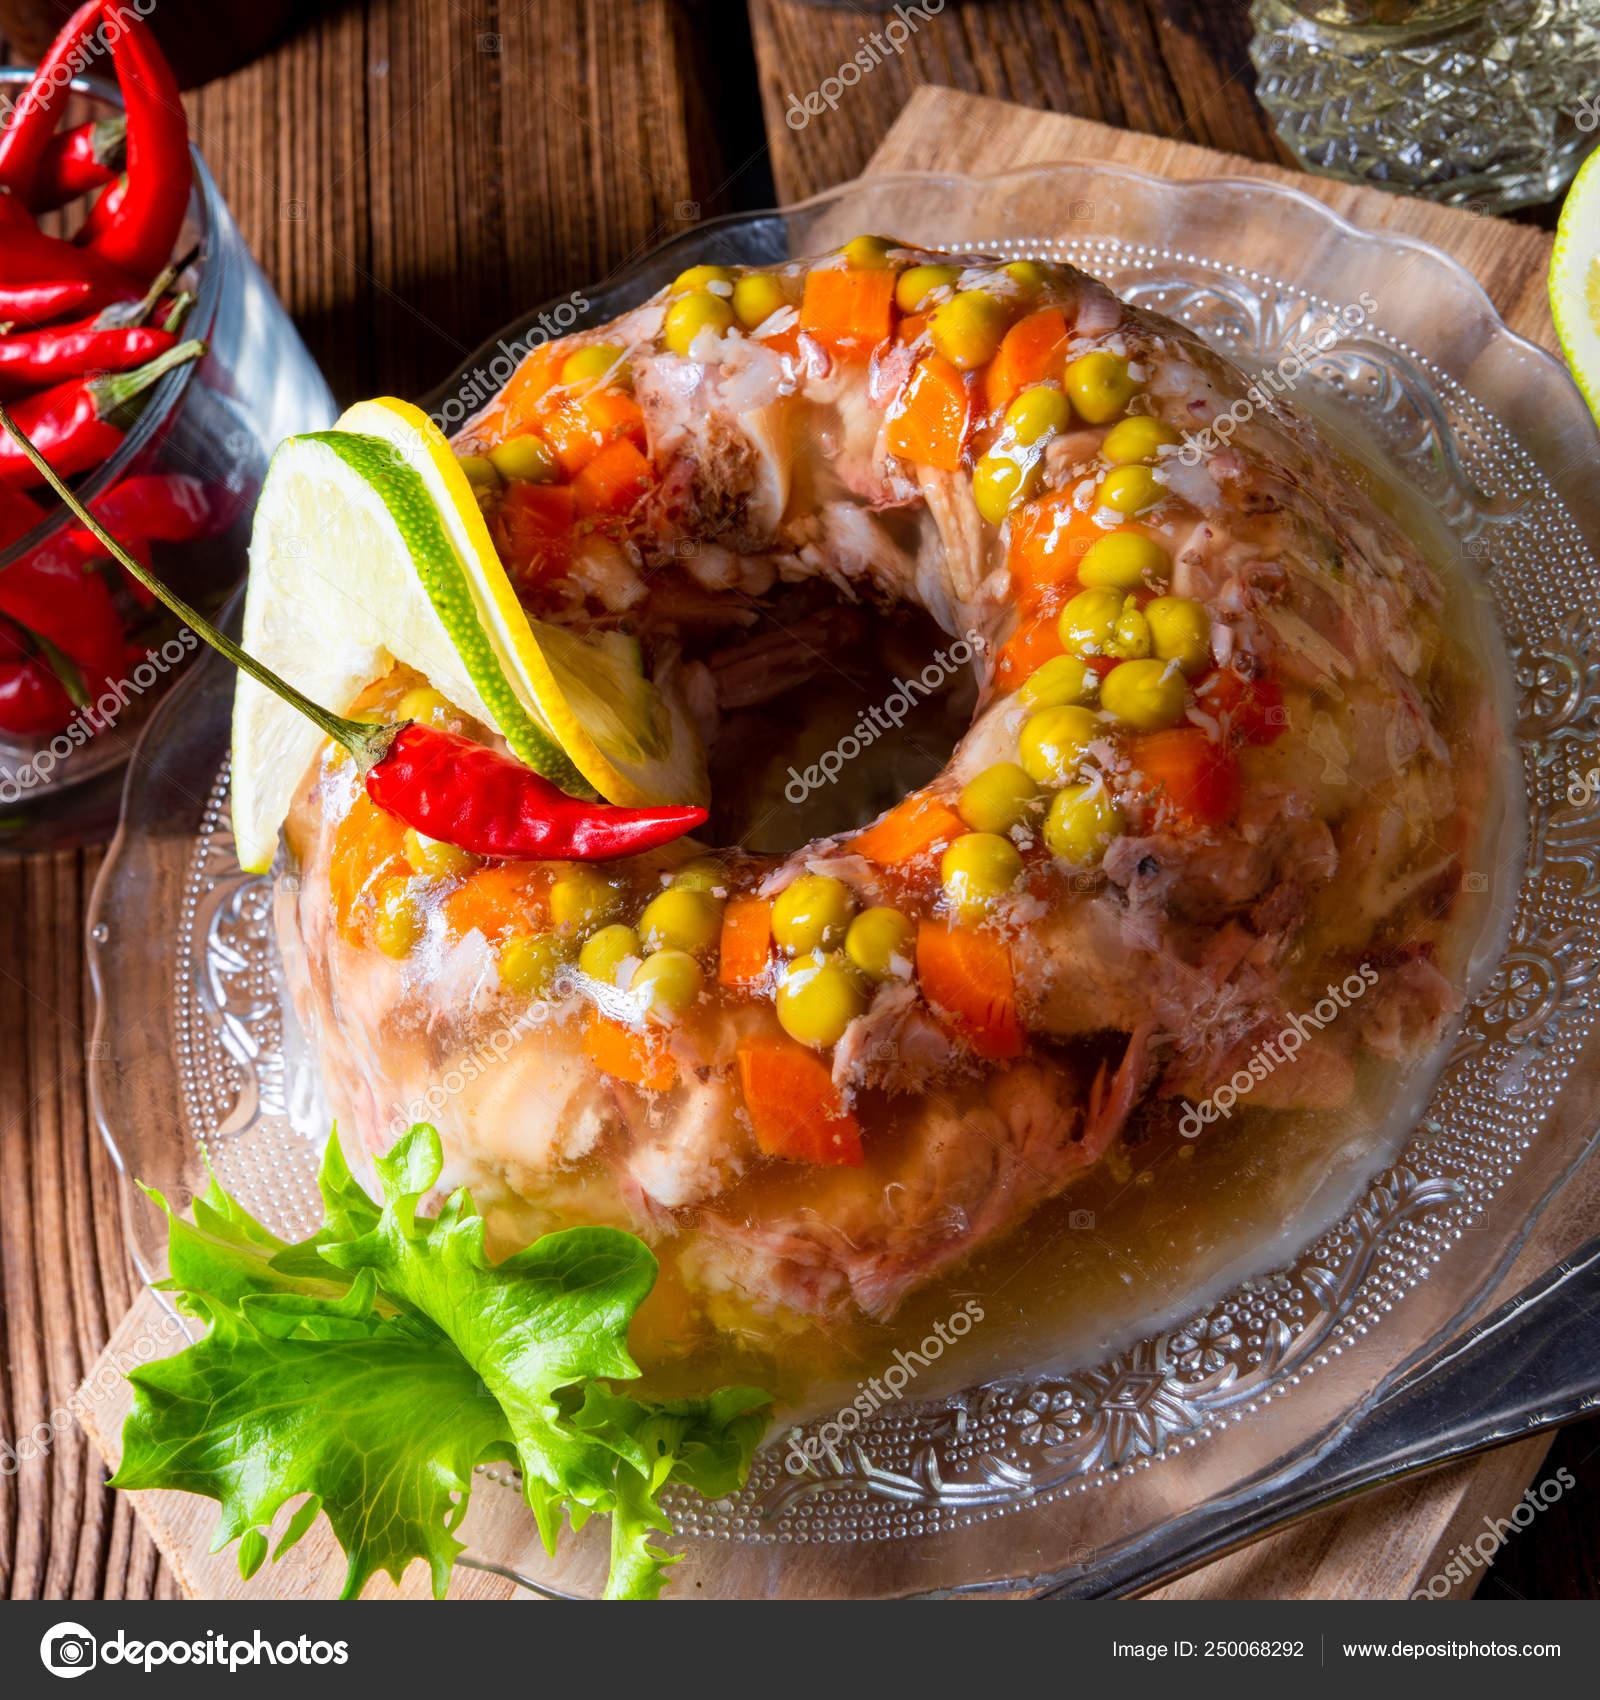 Tasty jelly with pork knuckle and pork legs — Stock Photo